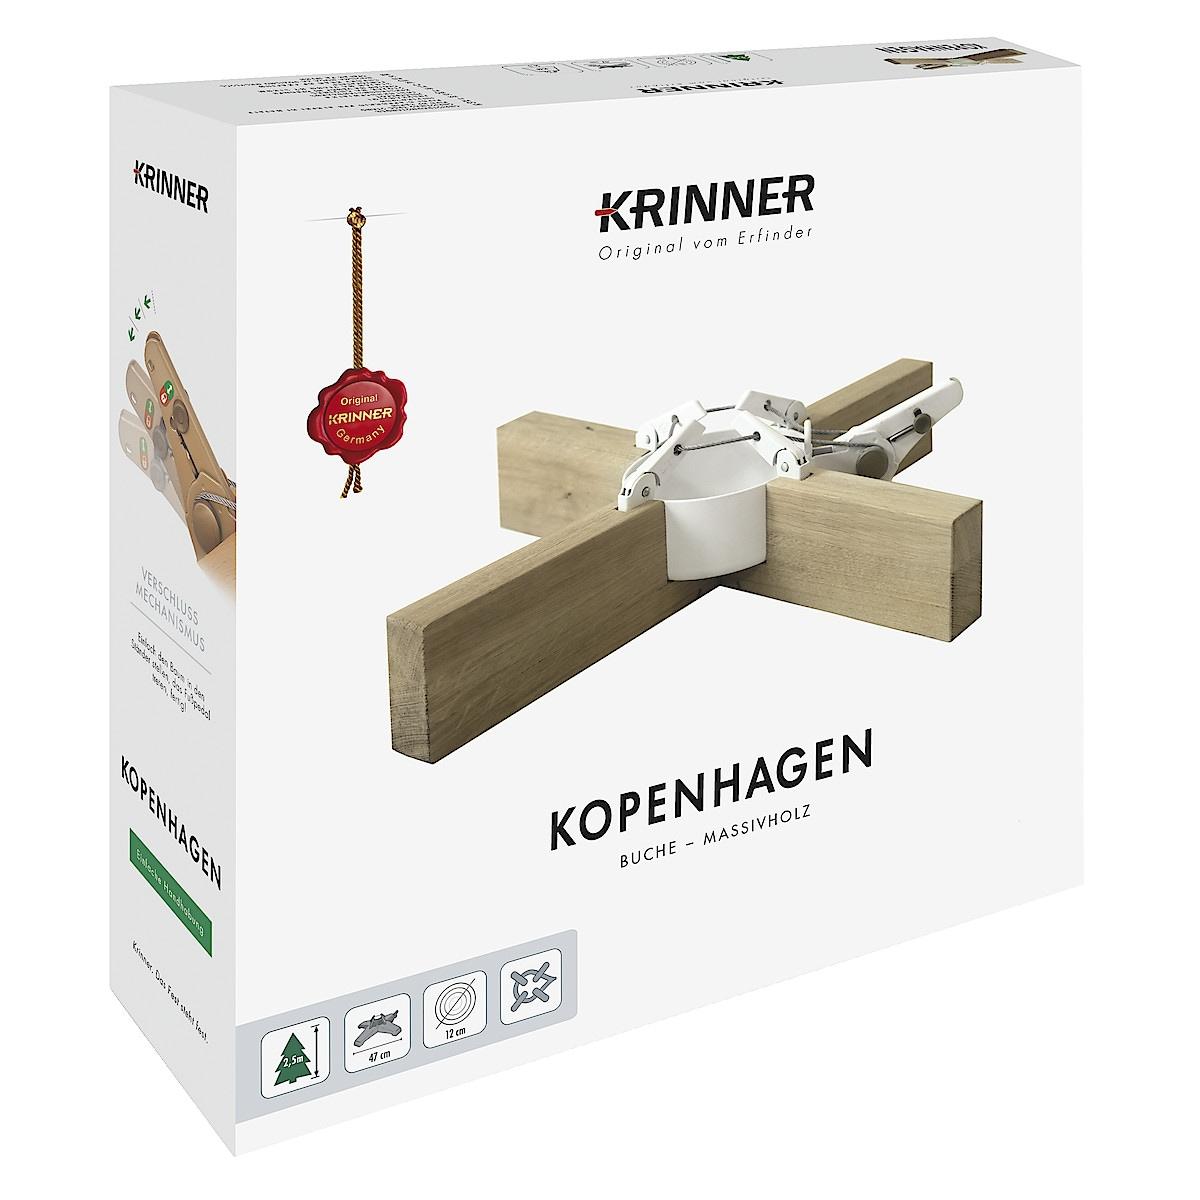 Kuusenjalka Krinner Kopenhagen